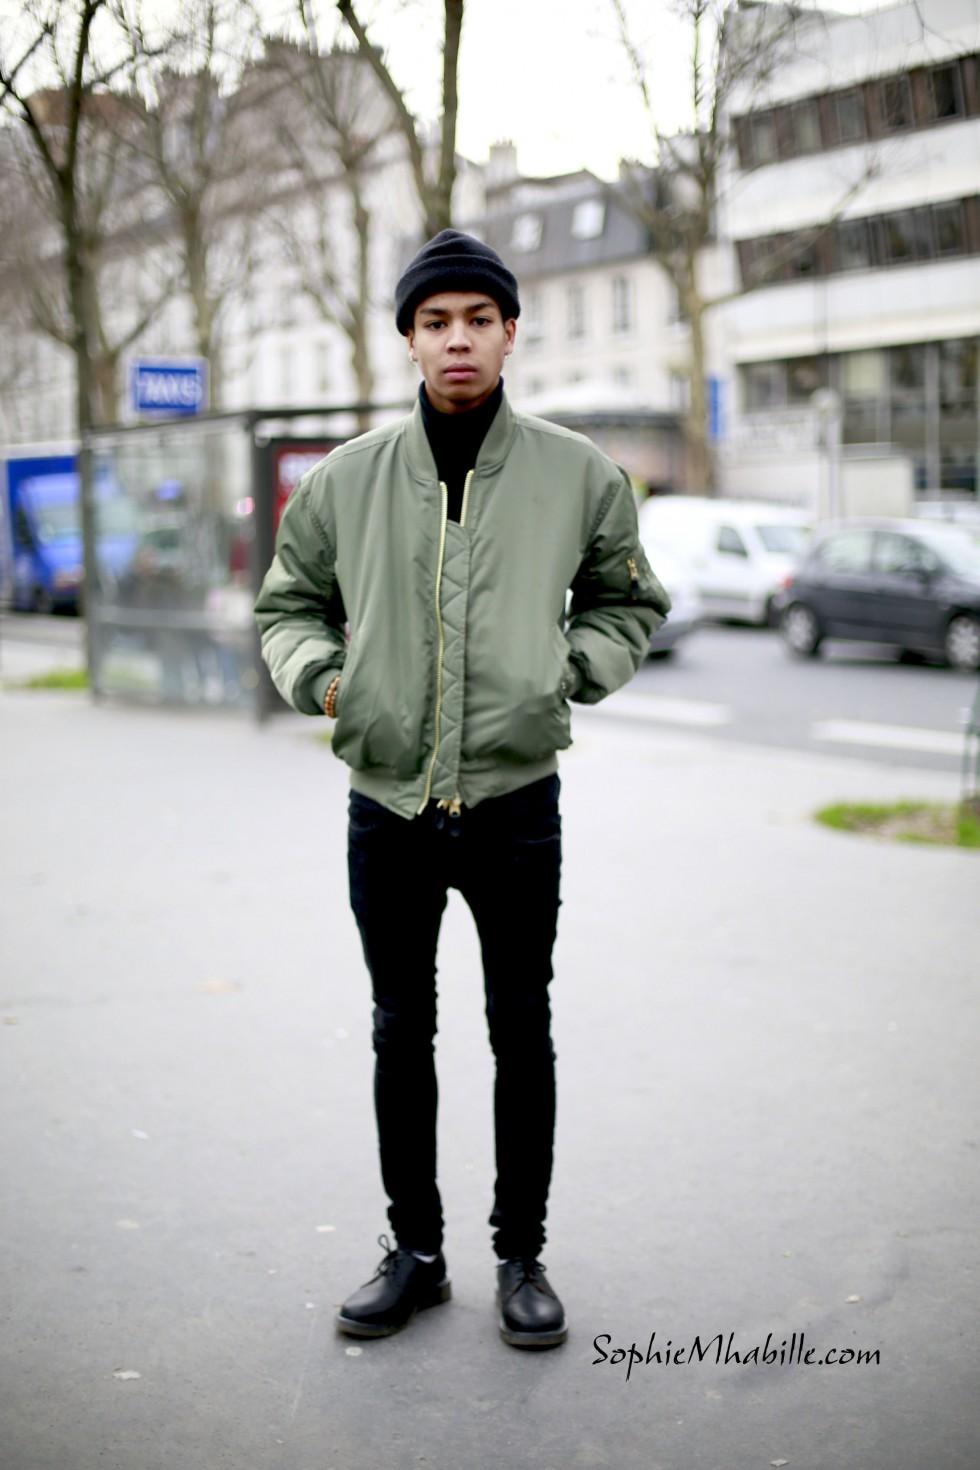 quentin-randria_sophie-mhabille_men-street-fashion-paris-980x1470.jpg